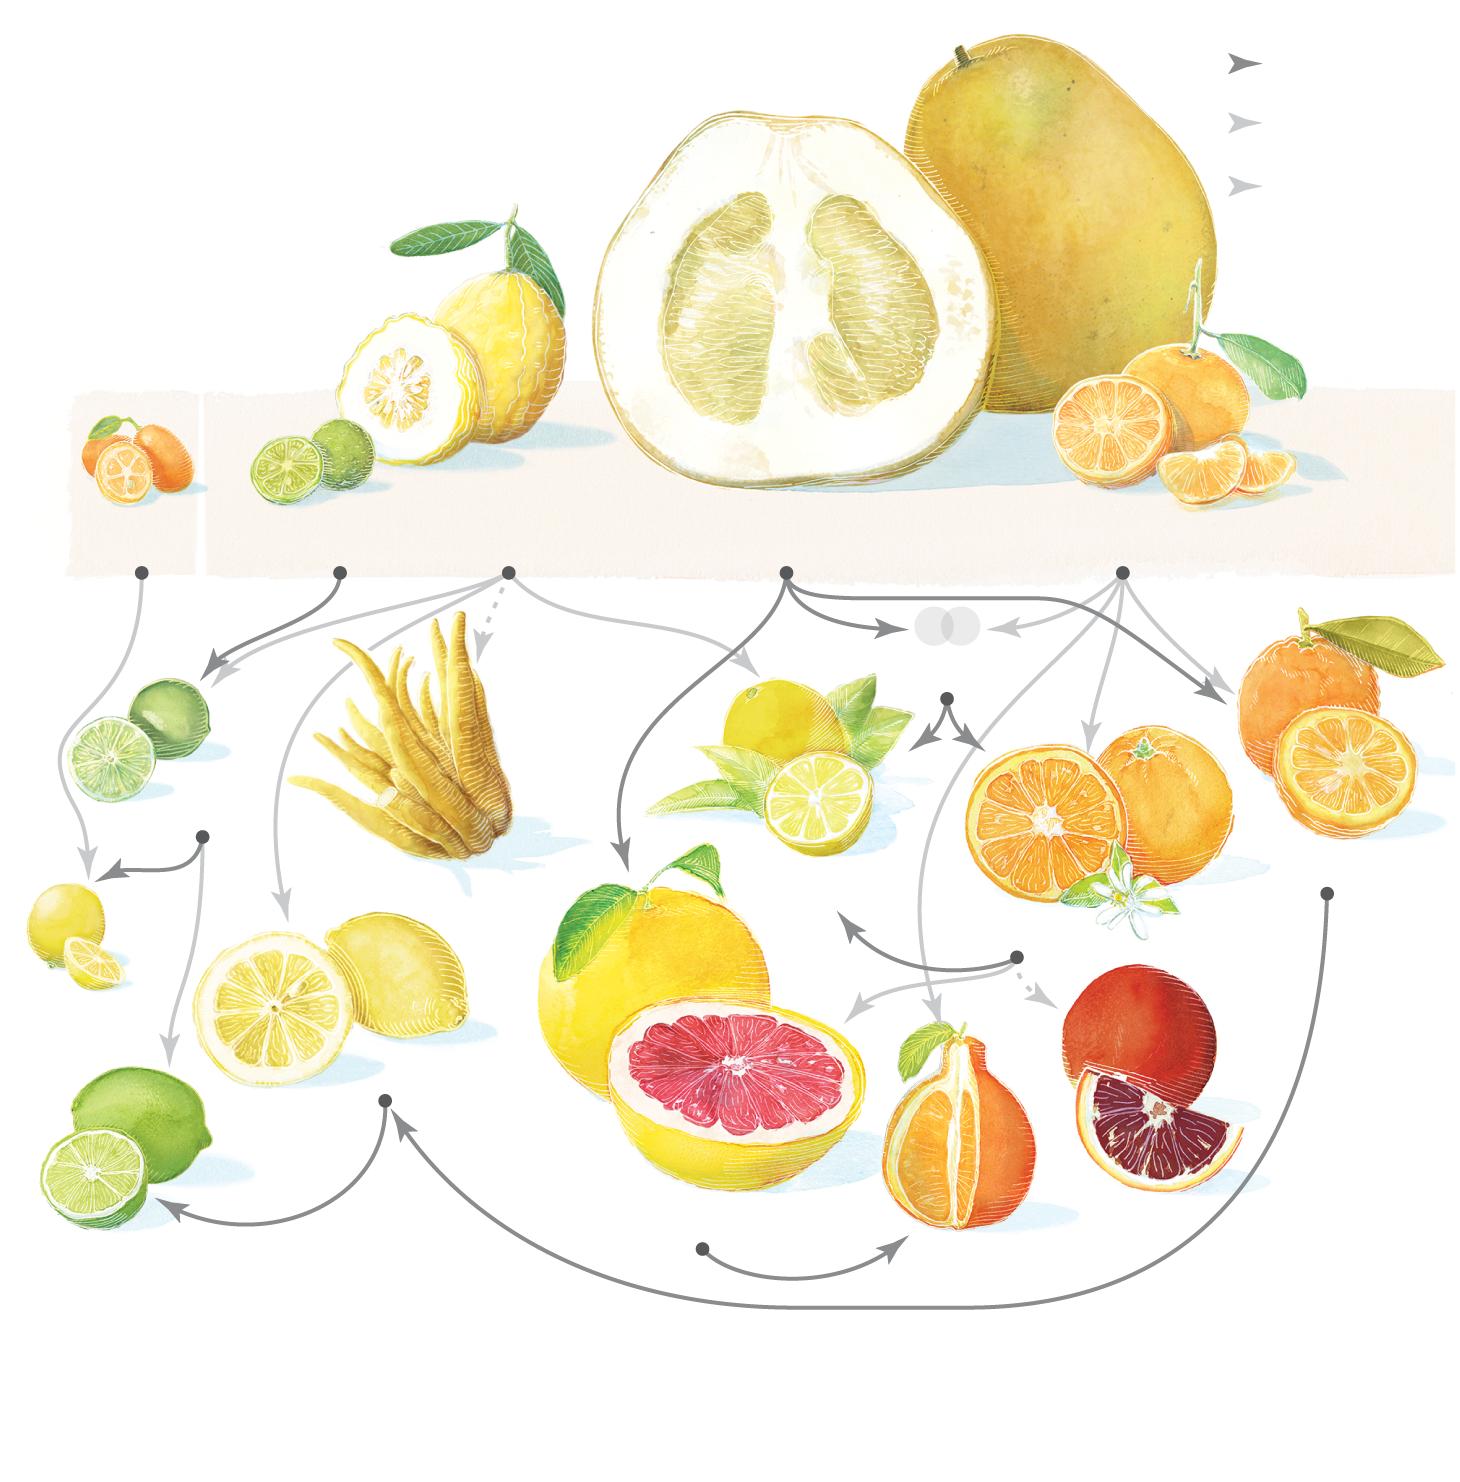 The Citrus Family Tree.